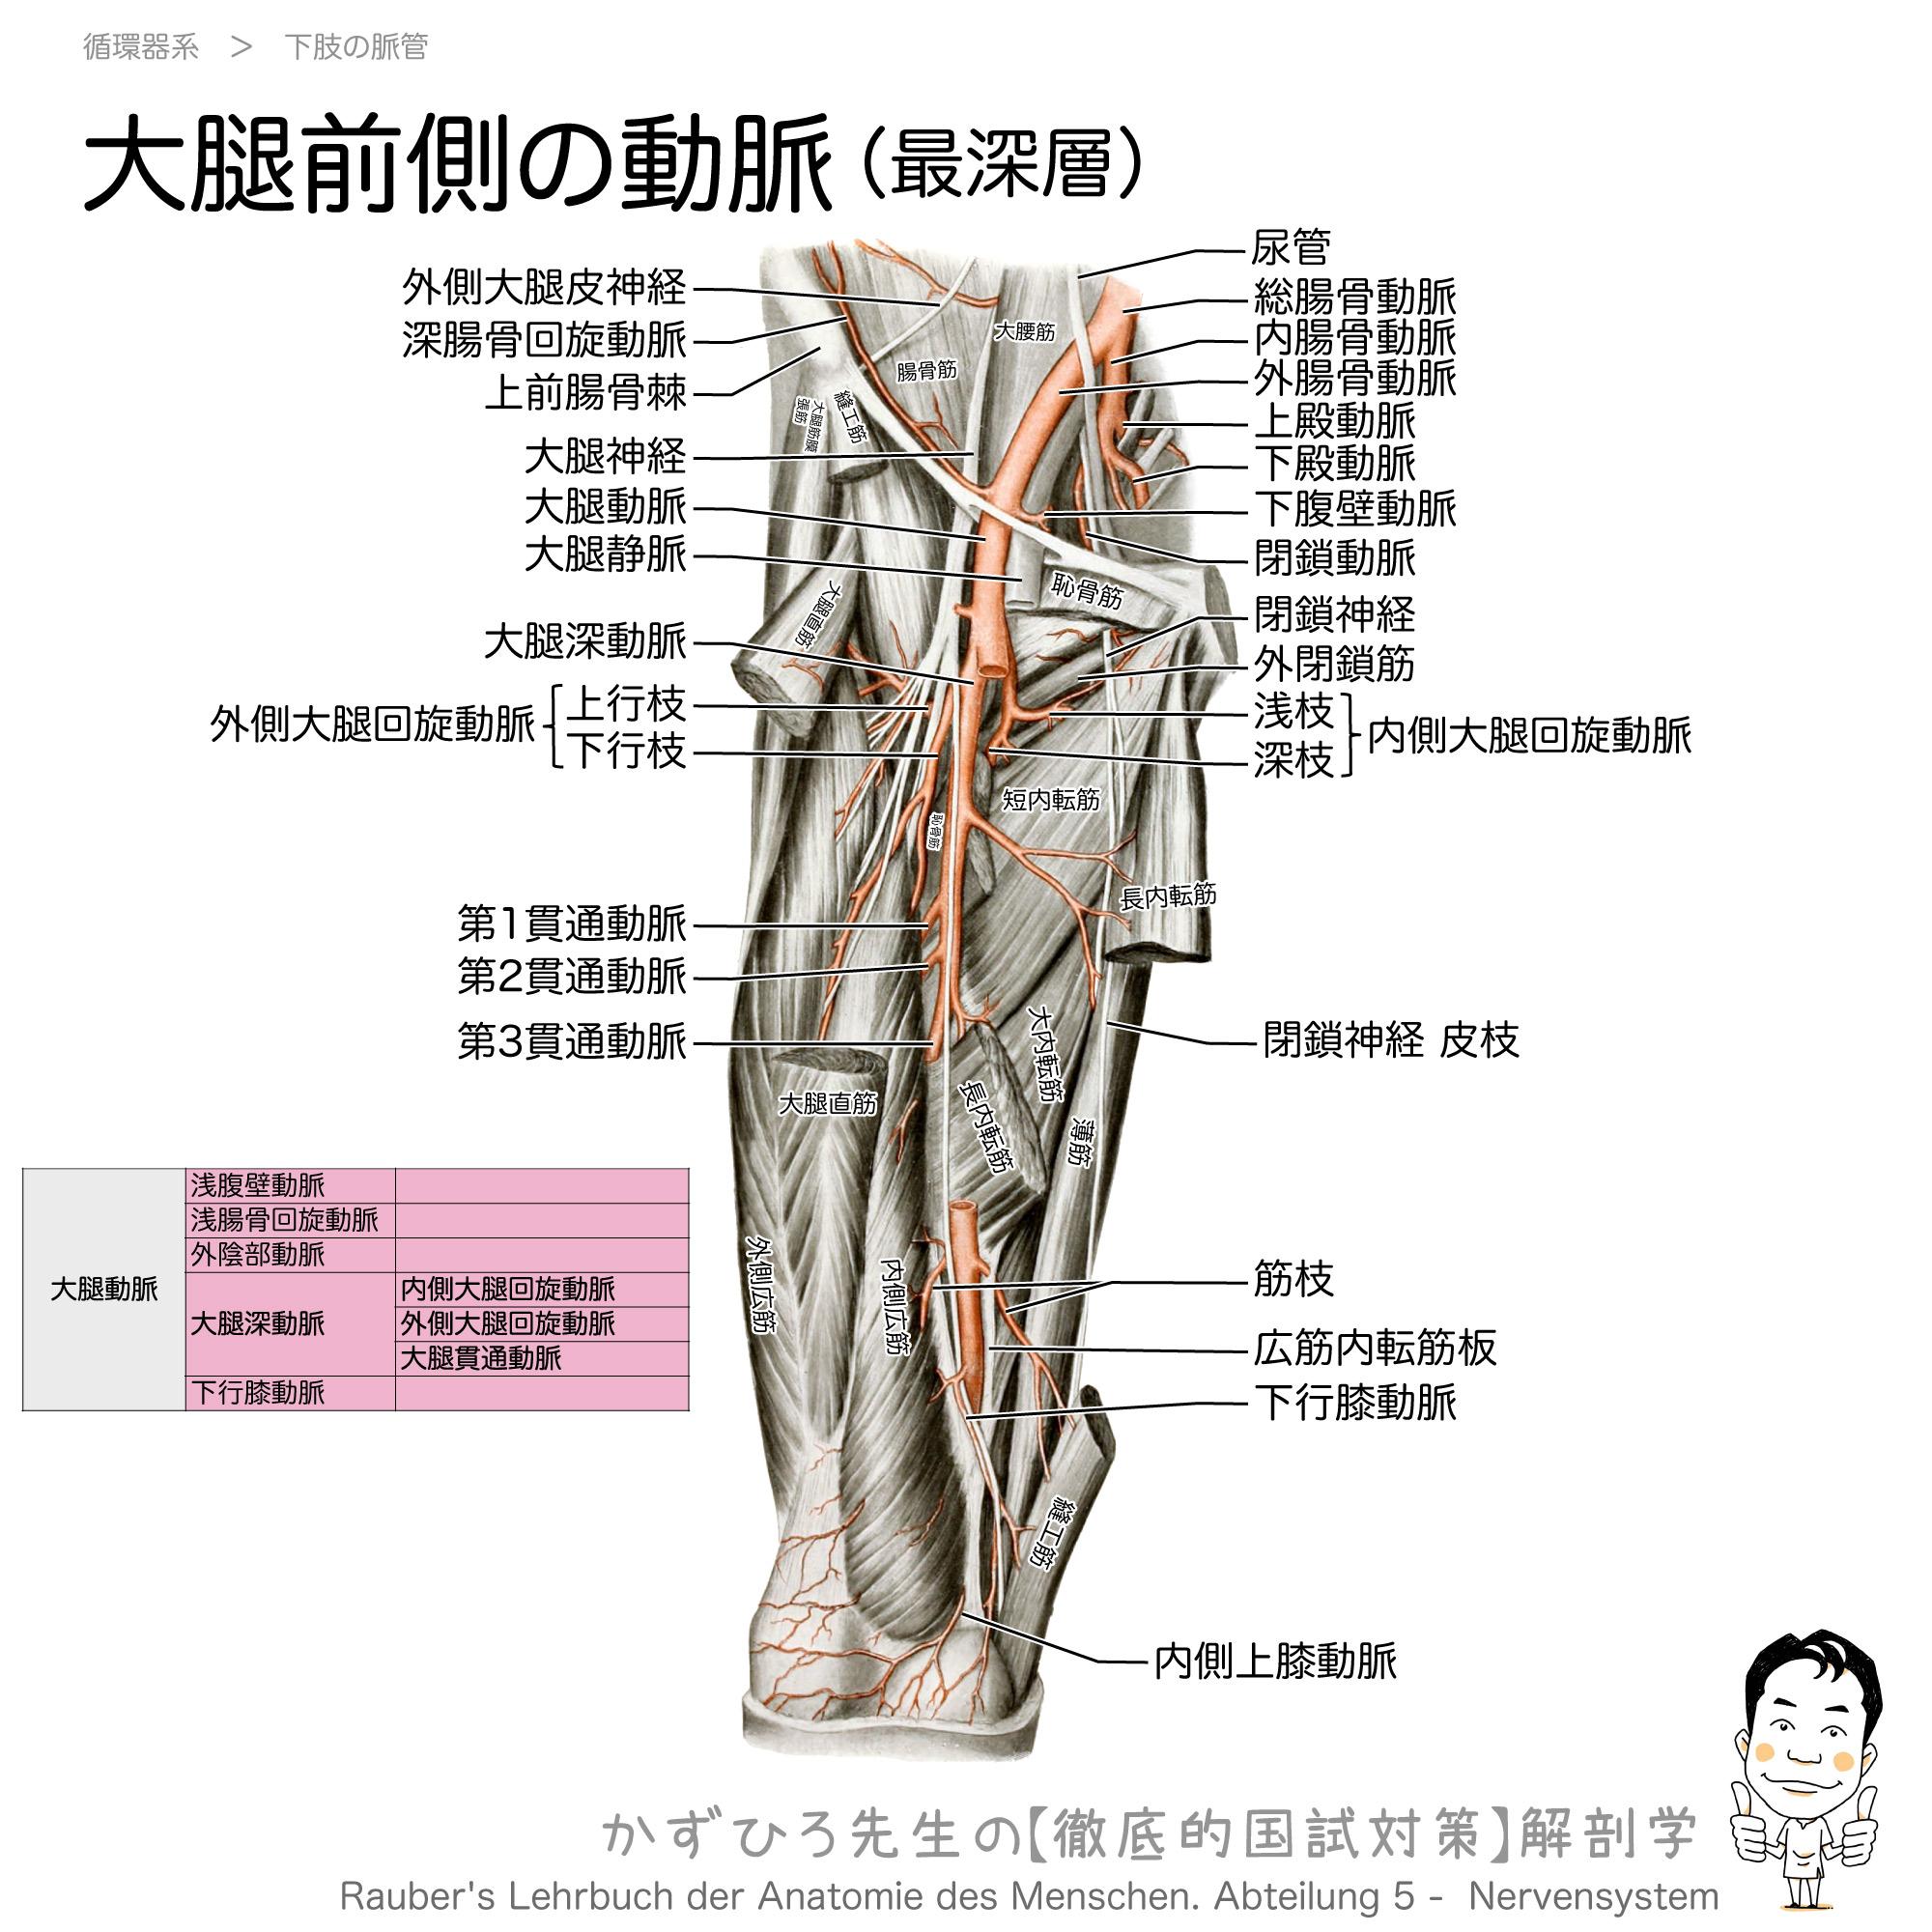 大腿深動脈とその枝(内側大腿回旋動脈・外側大腿回旋動脈・貫通動脈)